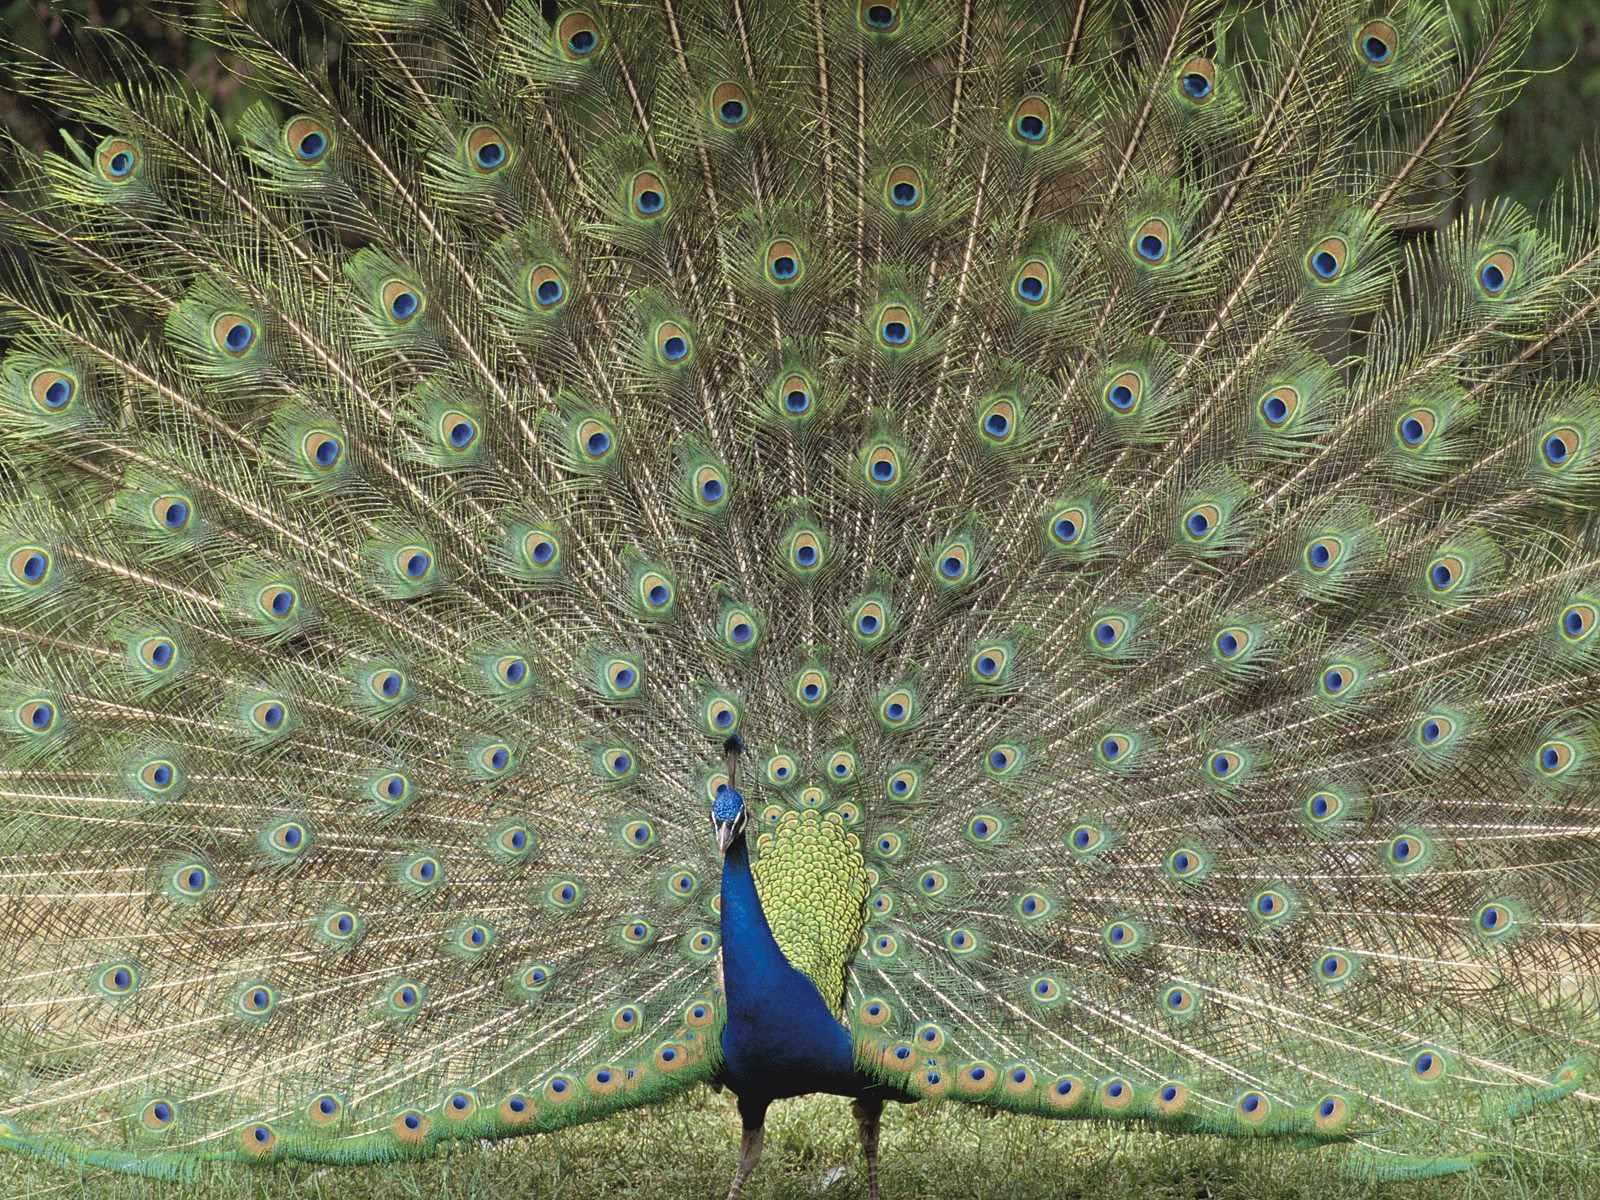 P 225 Jaros Ex 243 Ticos Wallpapers O Fondos Aves Hermosas Birds